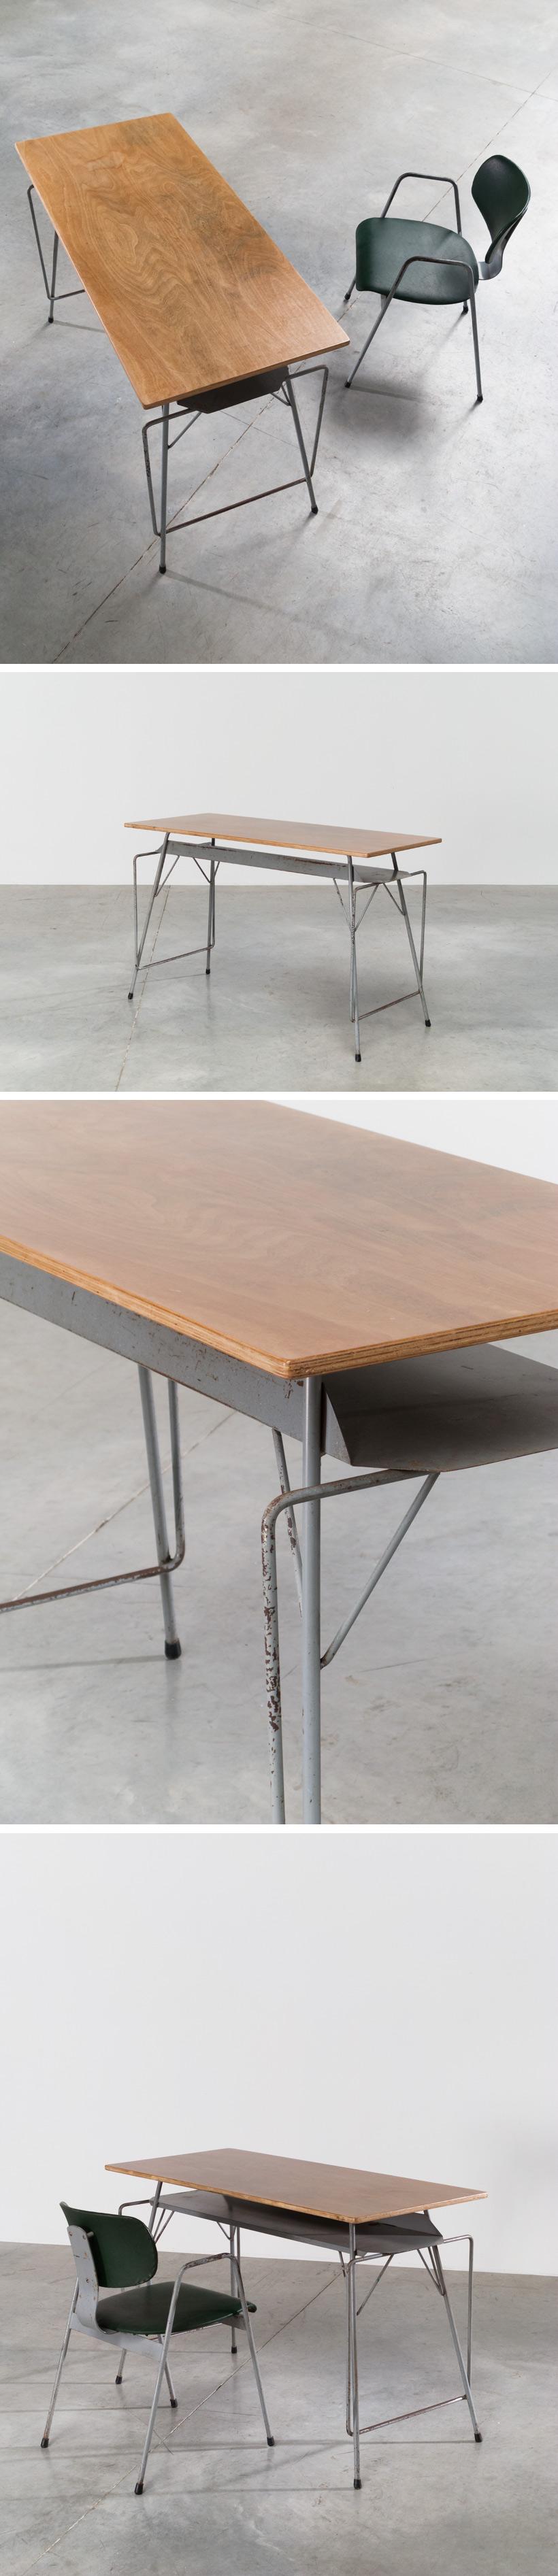 Willy Van Der Meeren Tubax grey writing table Large